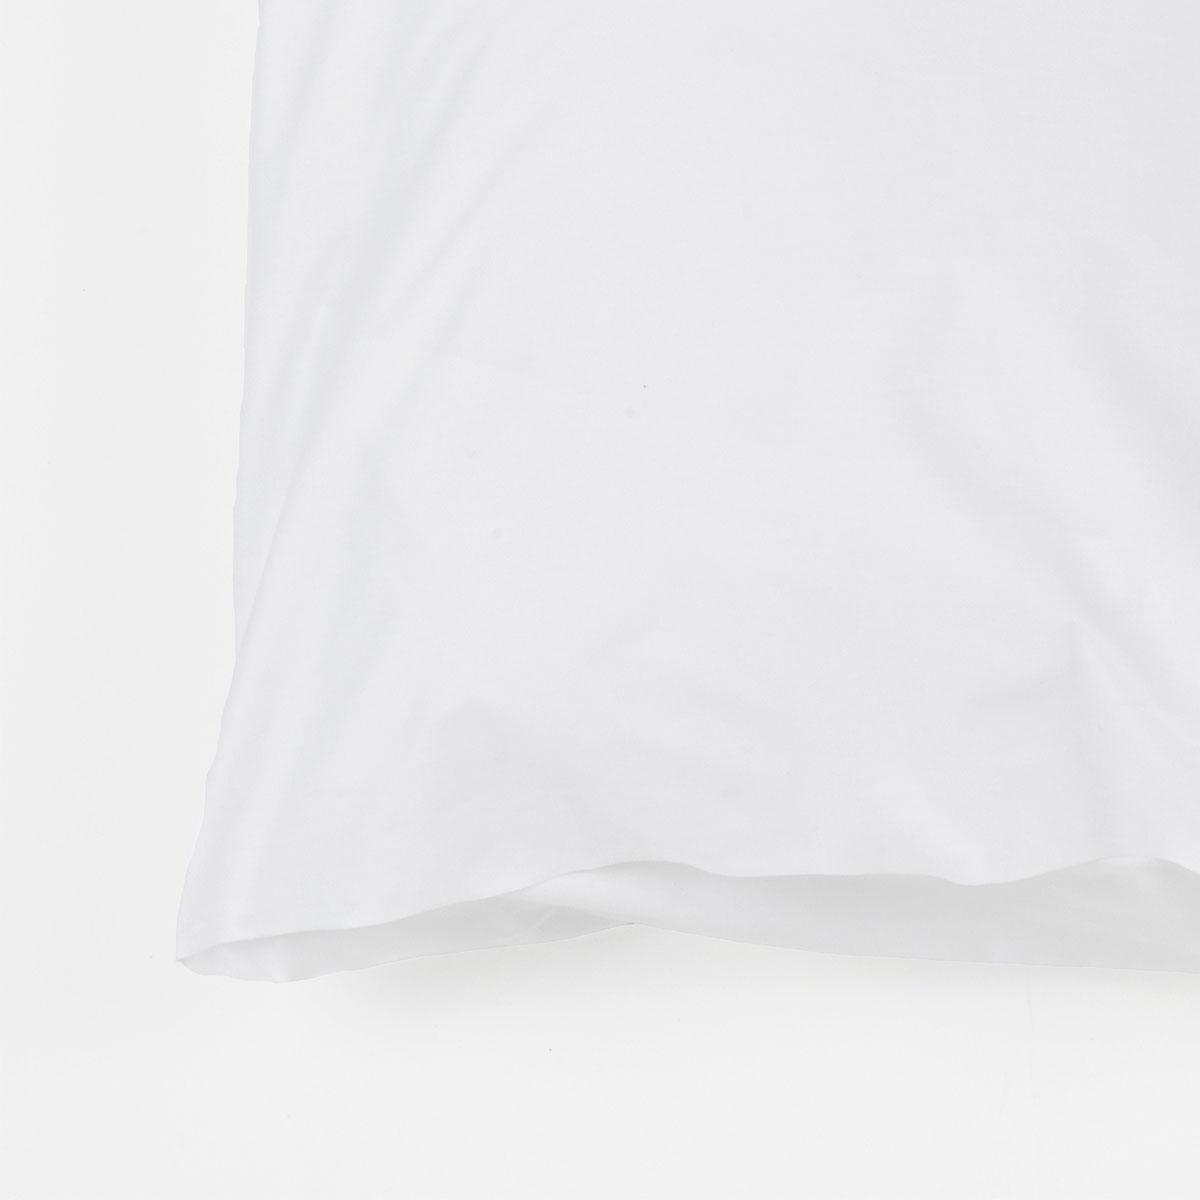 taie d 39 oreiller sac avec portefeuille pcn blanc standard. Black Bedroom Furniture Sets. Home Design Ideas